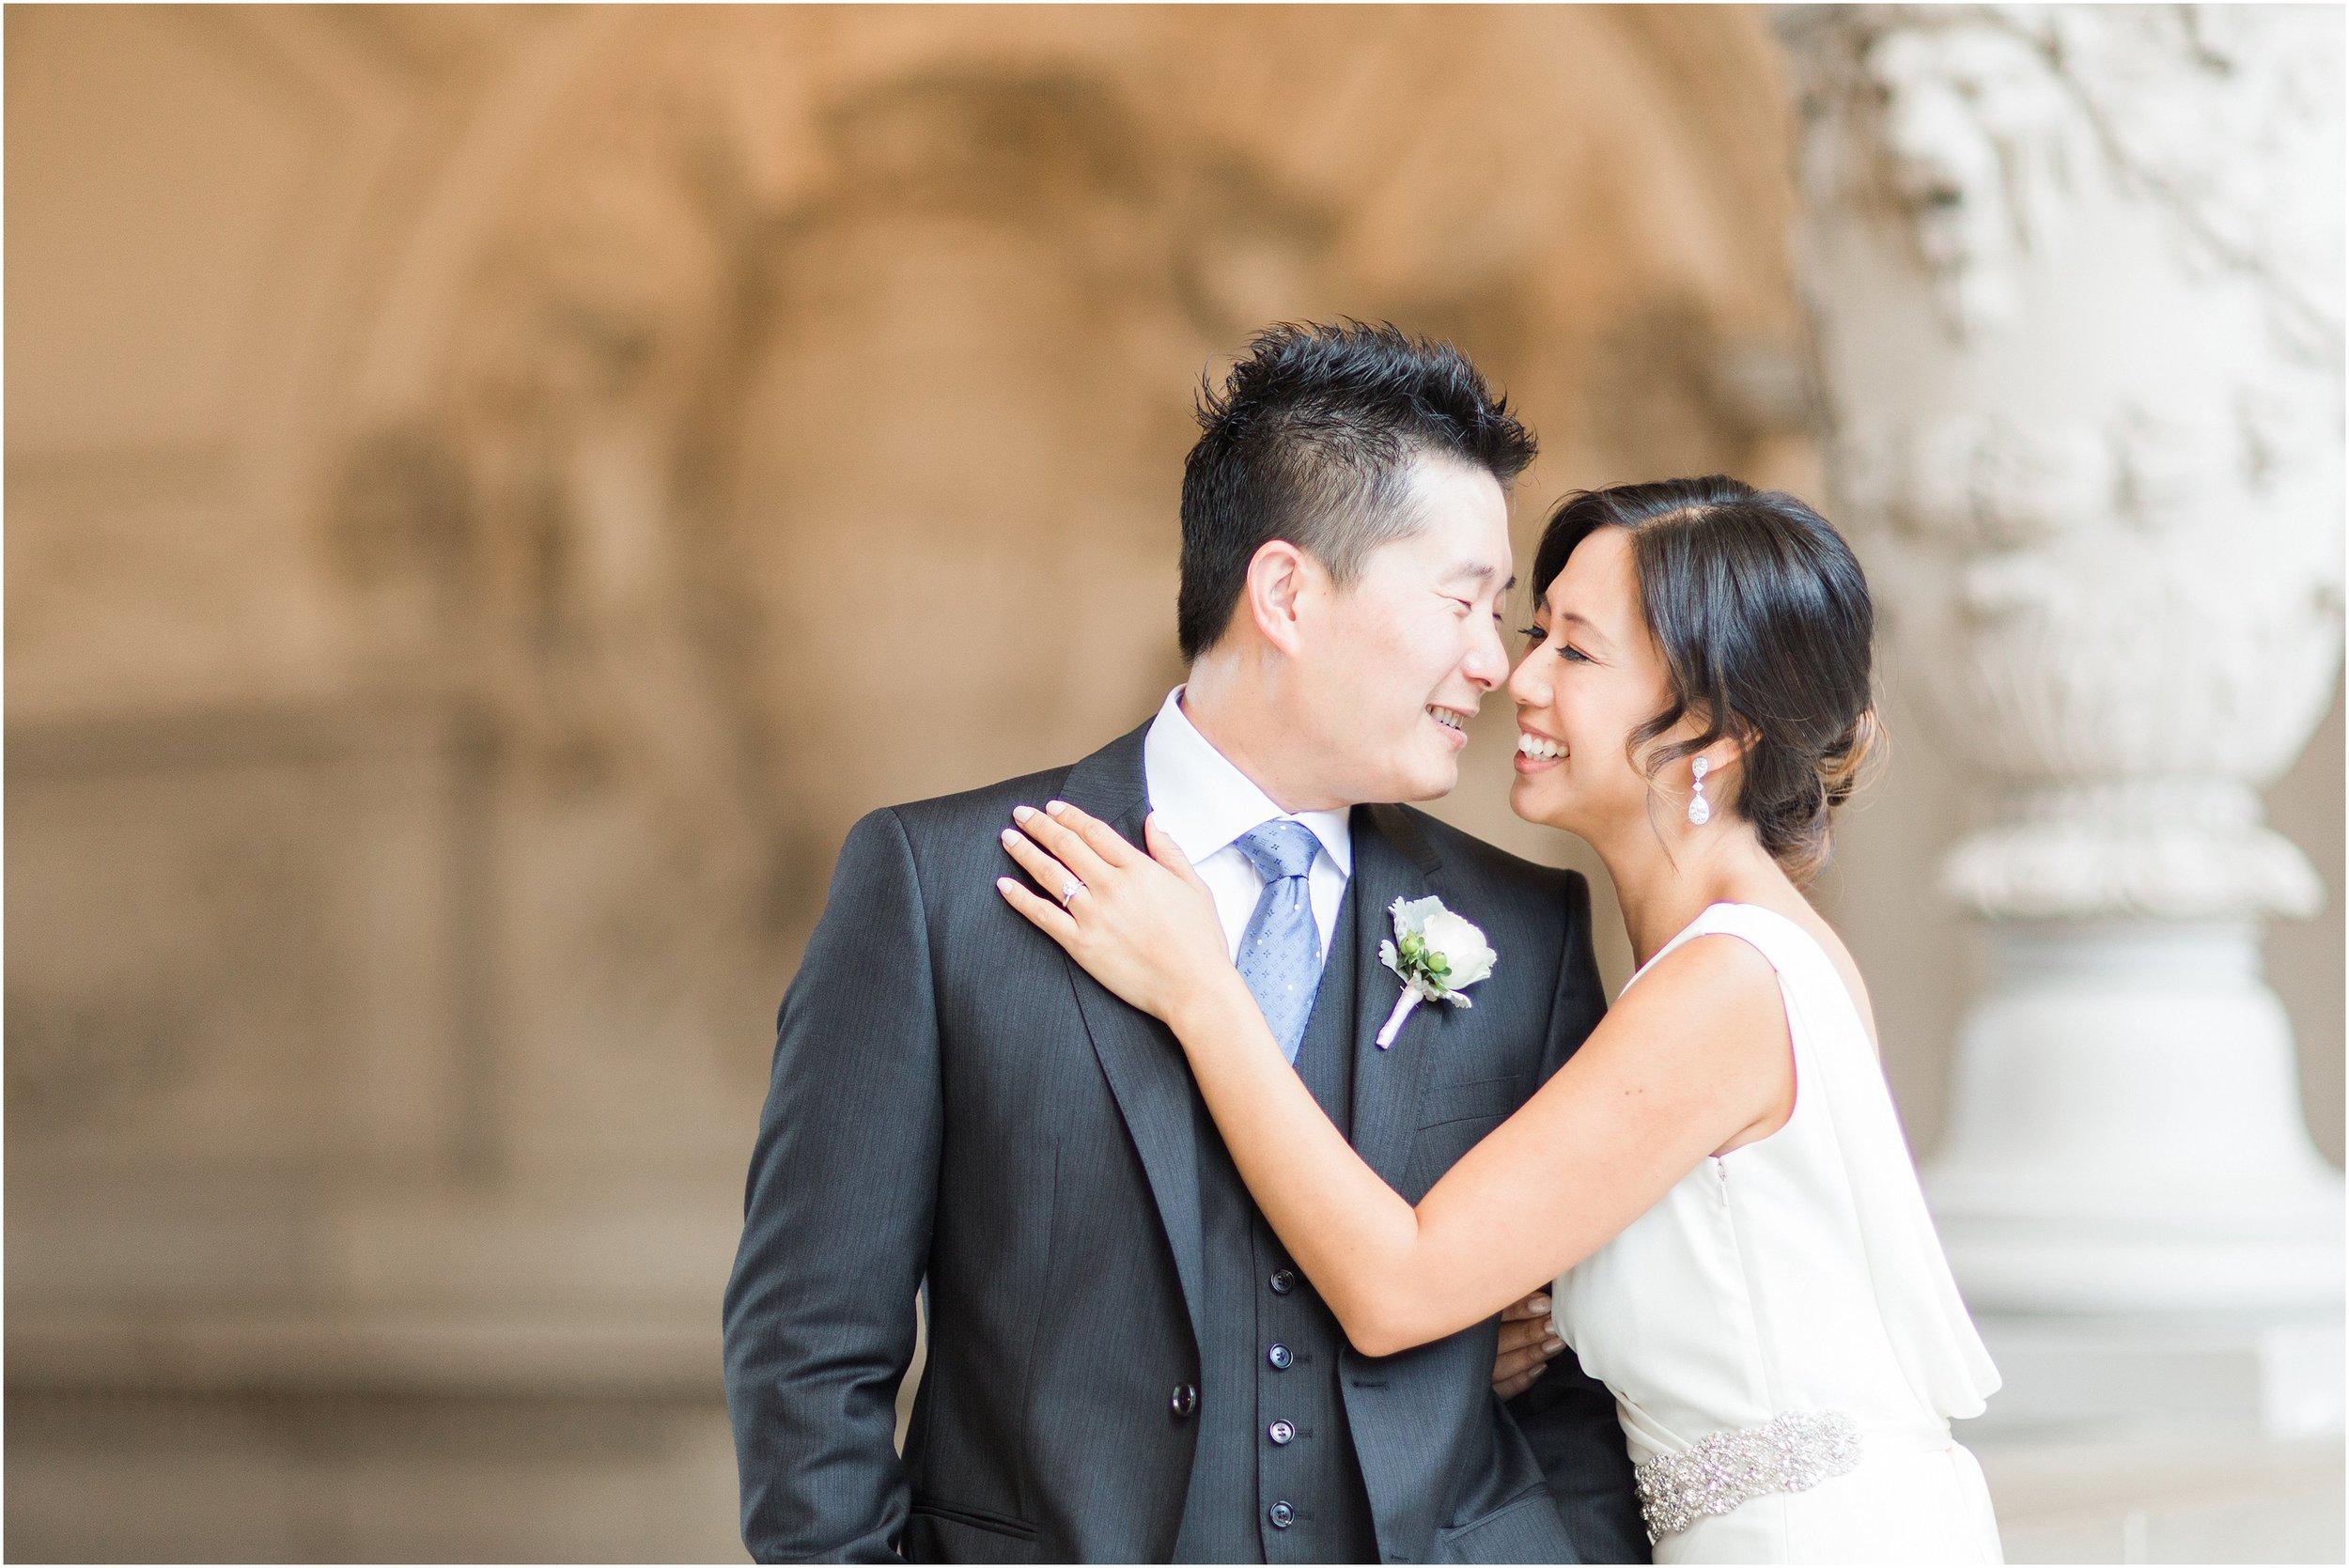 San_Francisco_City_Hall_Wedding_photographer-10.jpg